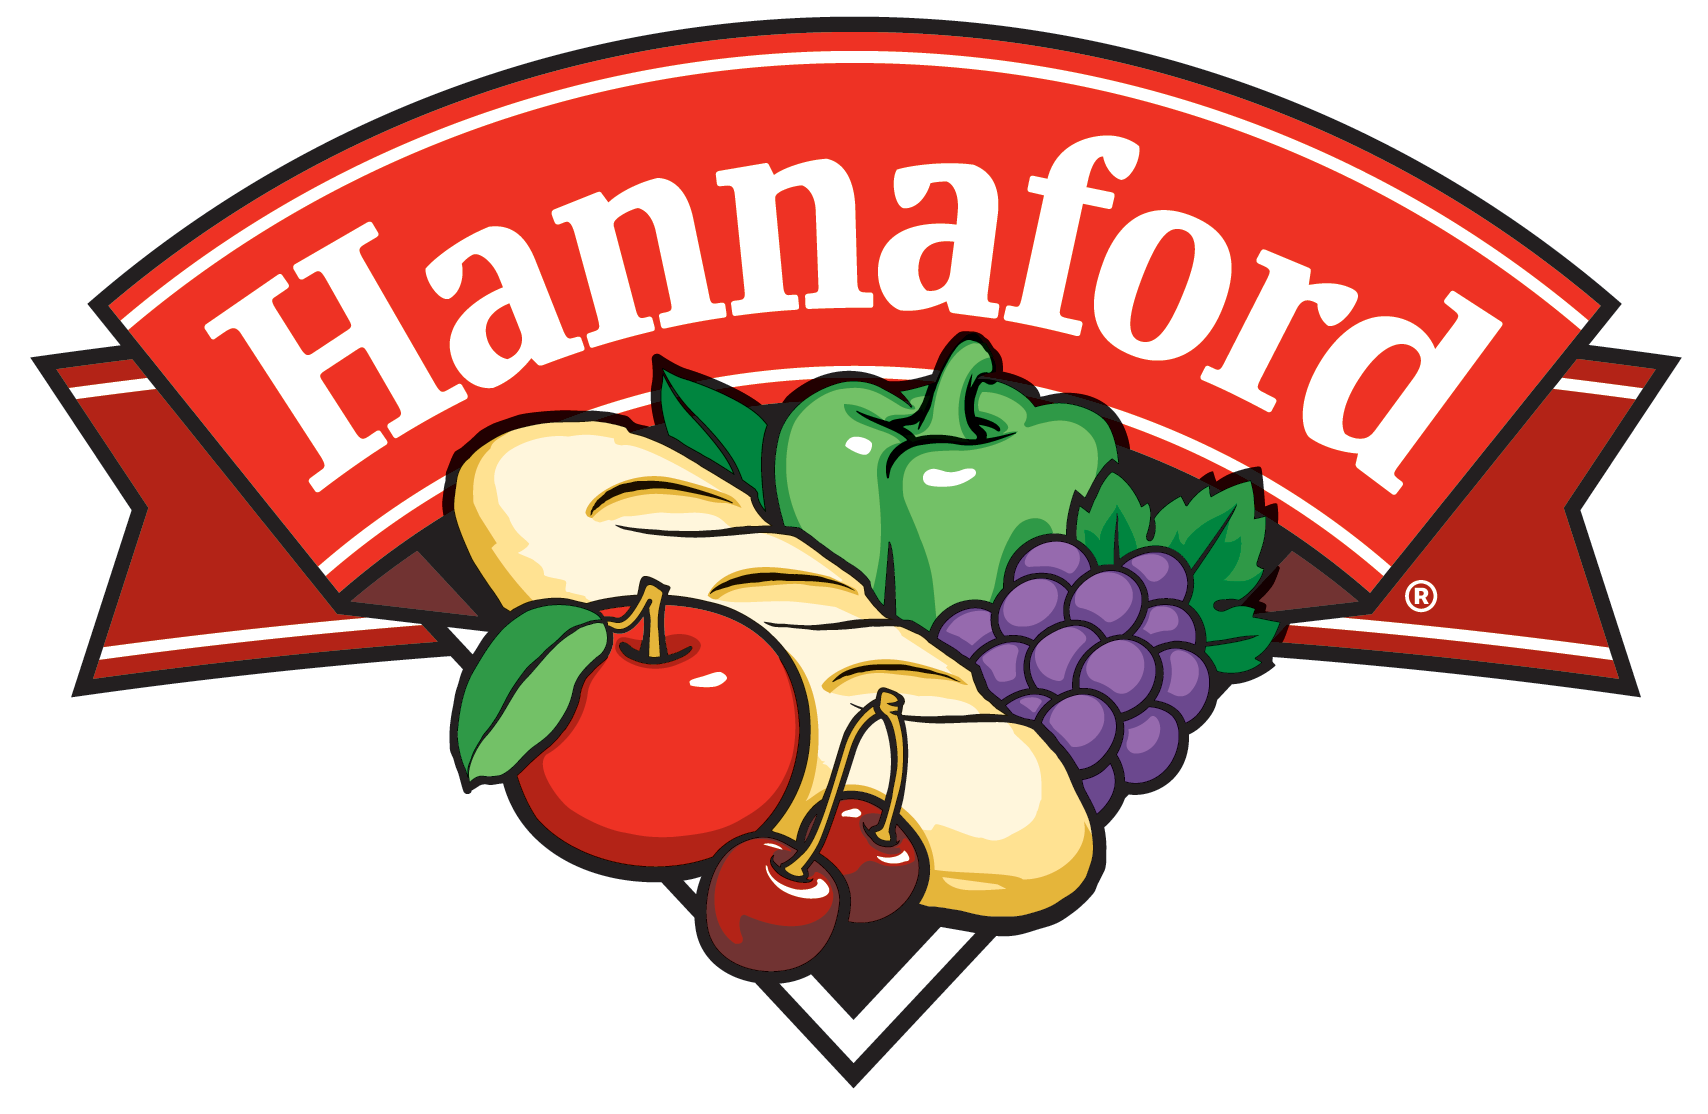 Broad Street Hannaford